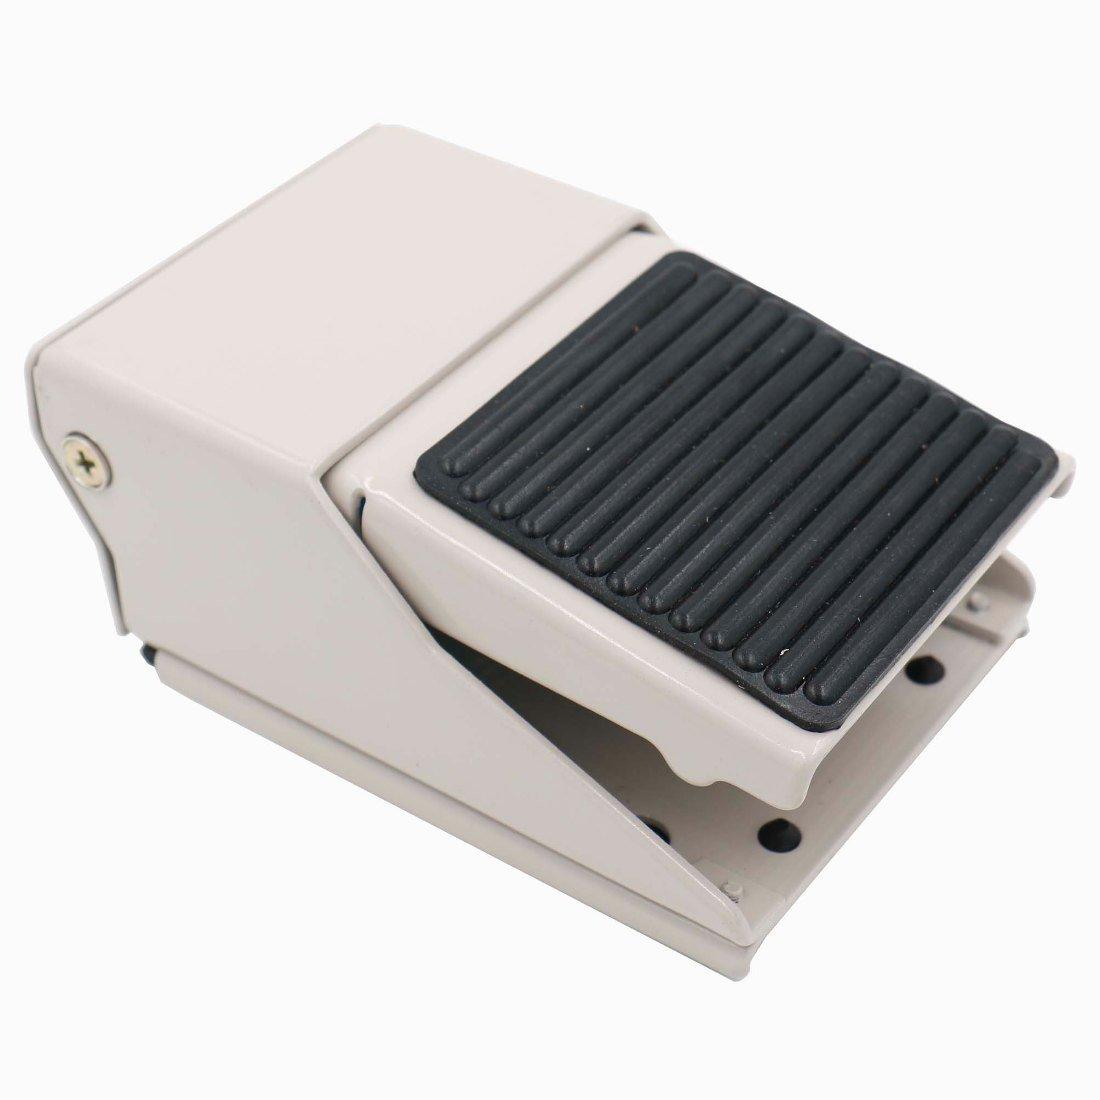 Baomain Pneumatic Foot Pedal Valve FV-420 Momentary 4 Way 2 Position 1/4''PT Threaded Nonslip Rubber